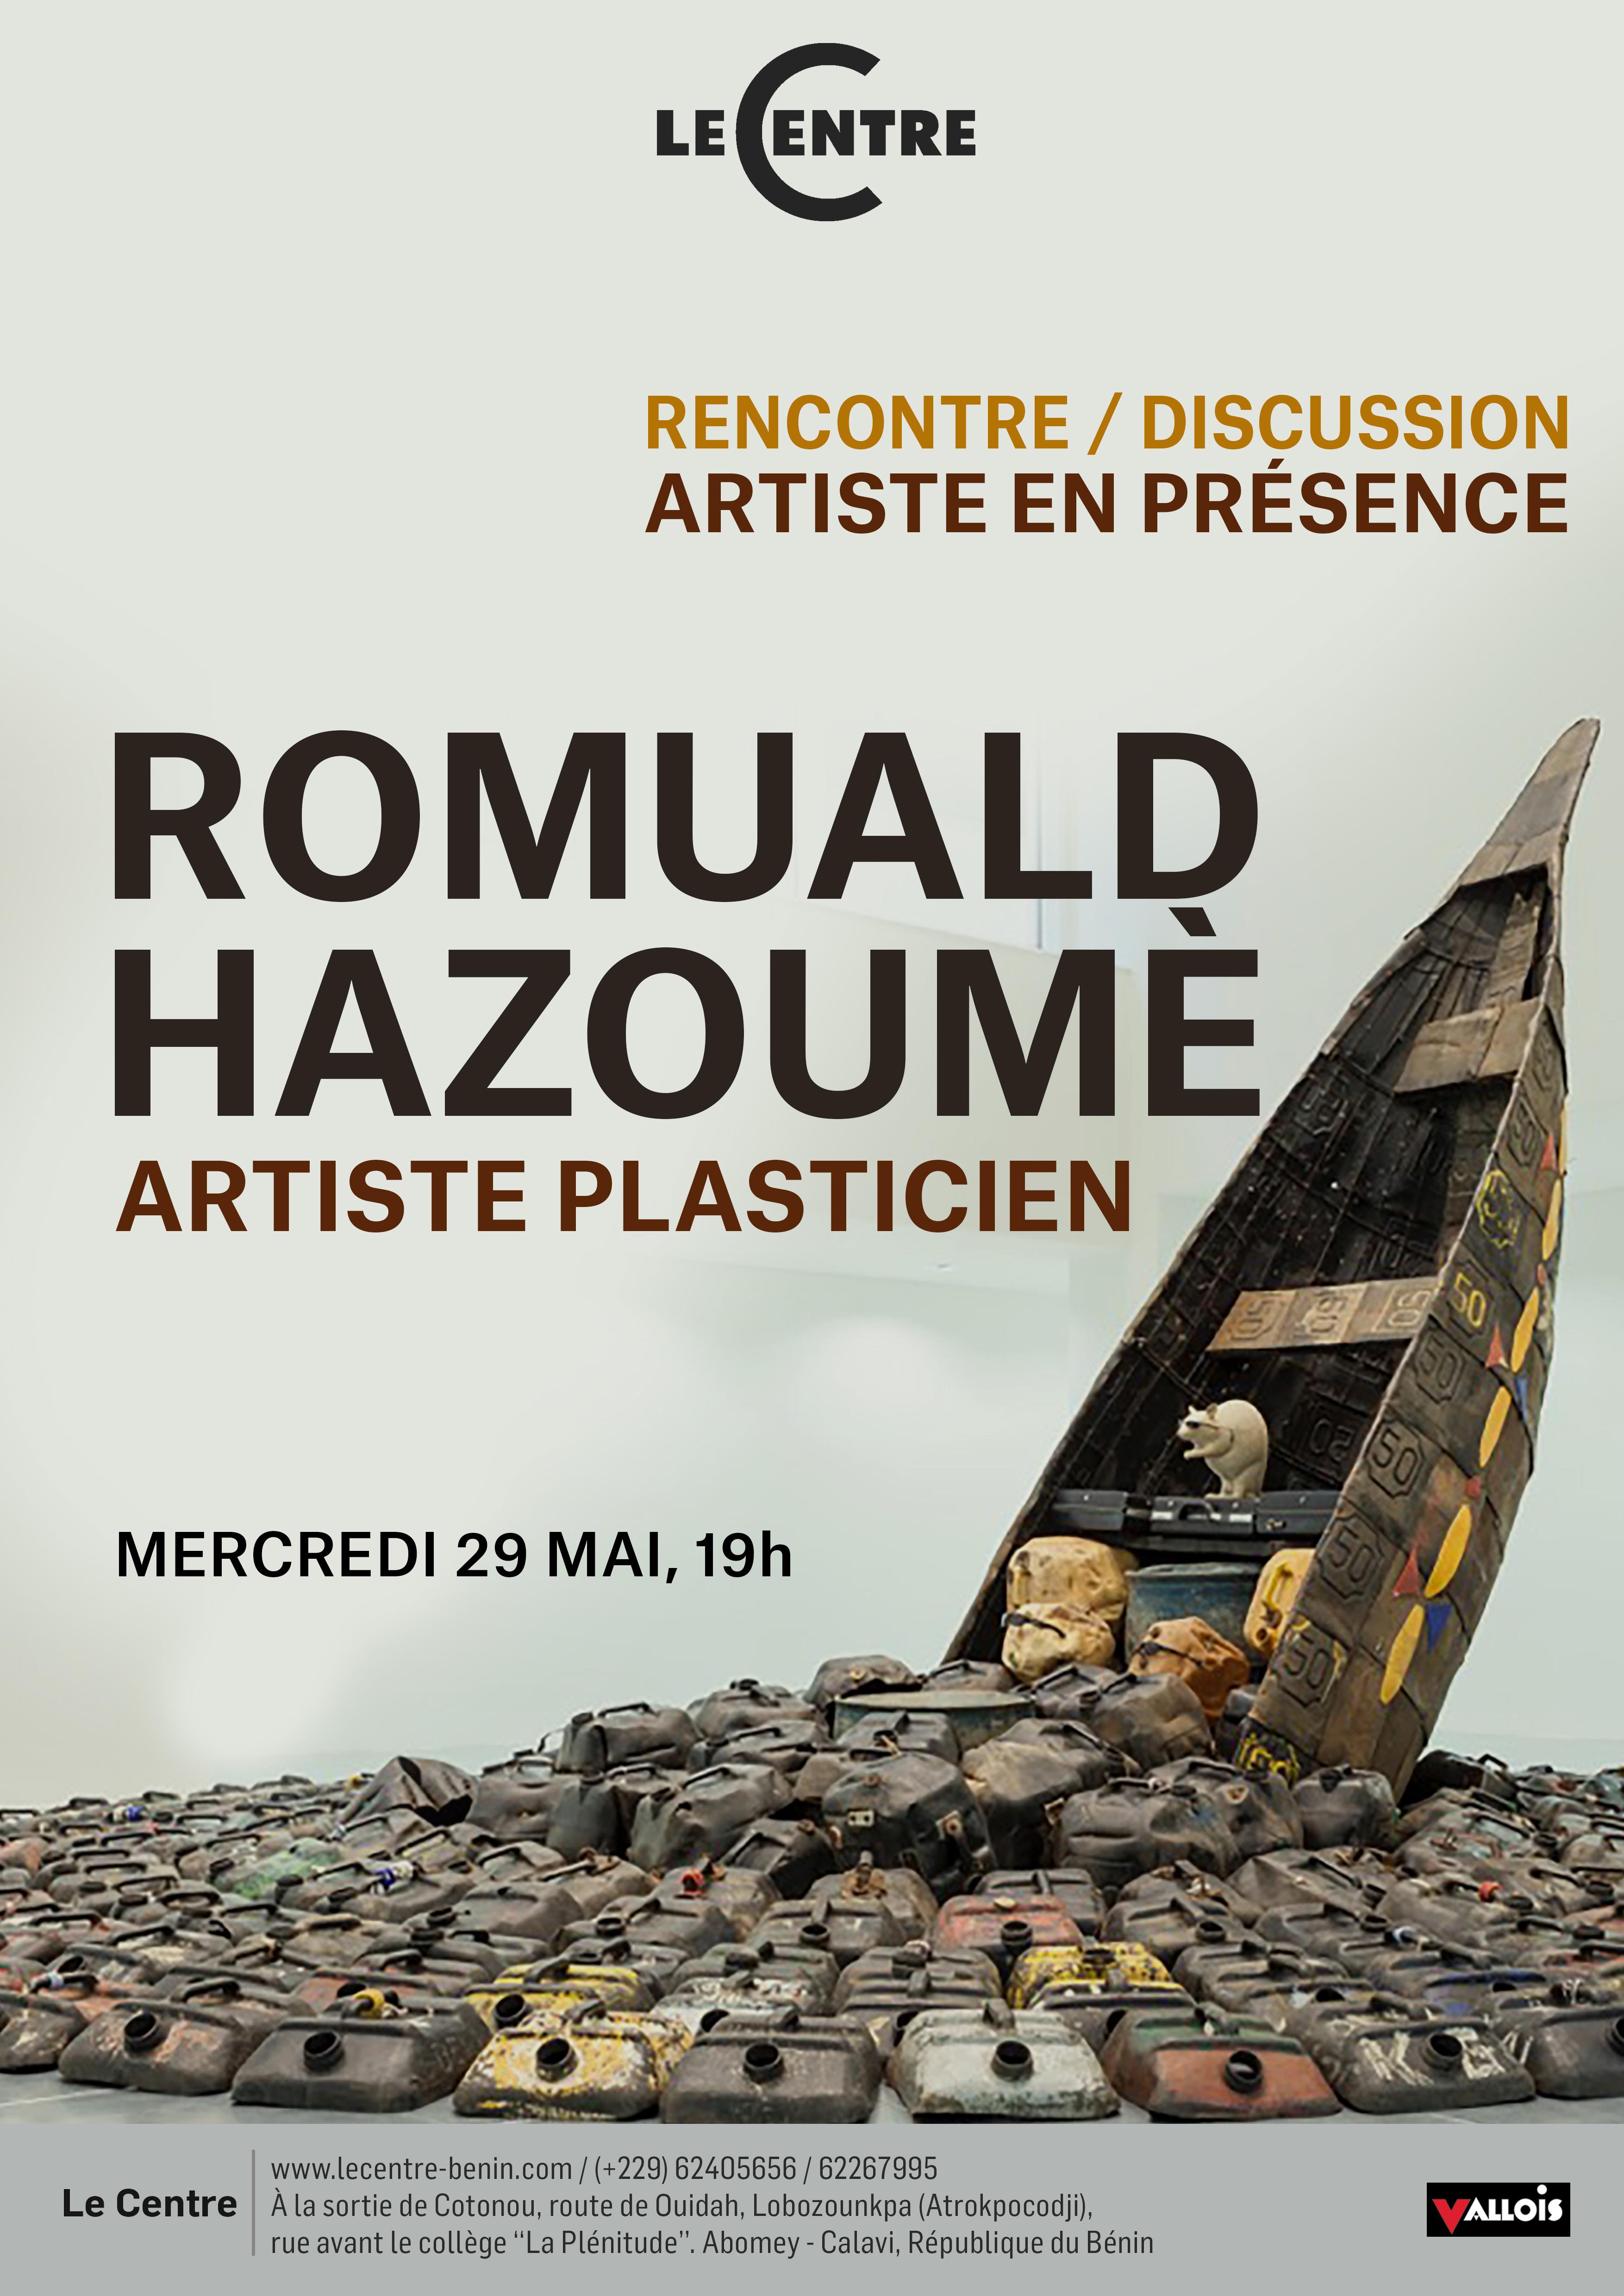 Artiste en présence, Romuald Hazoumè